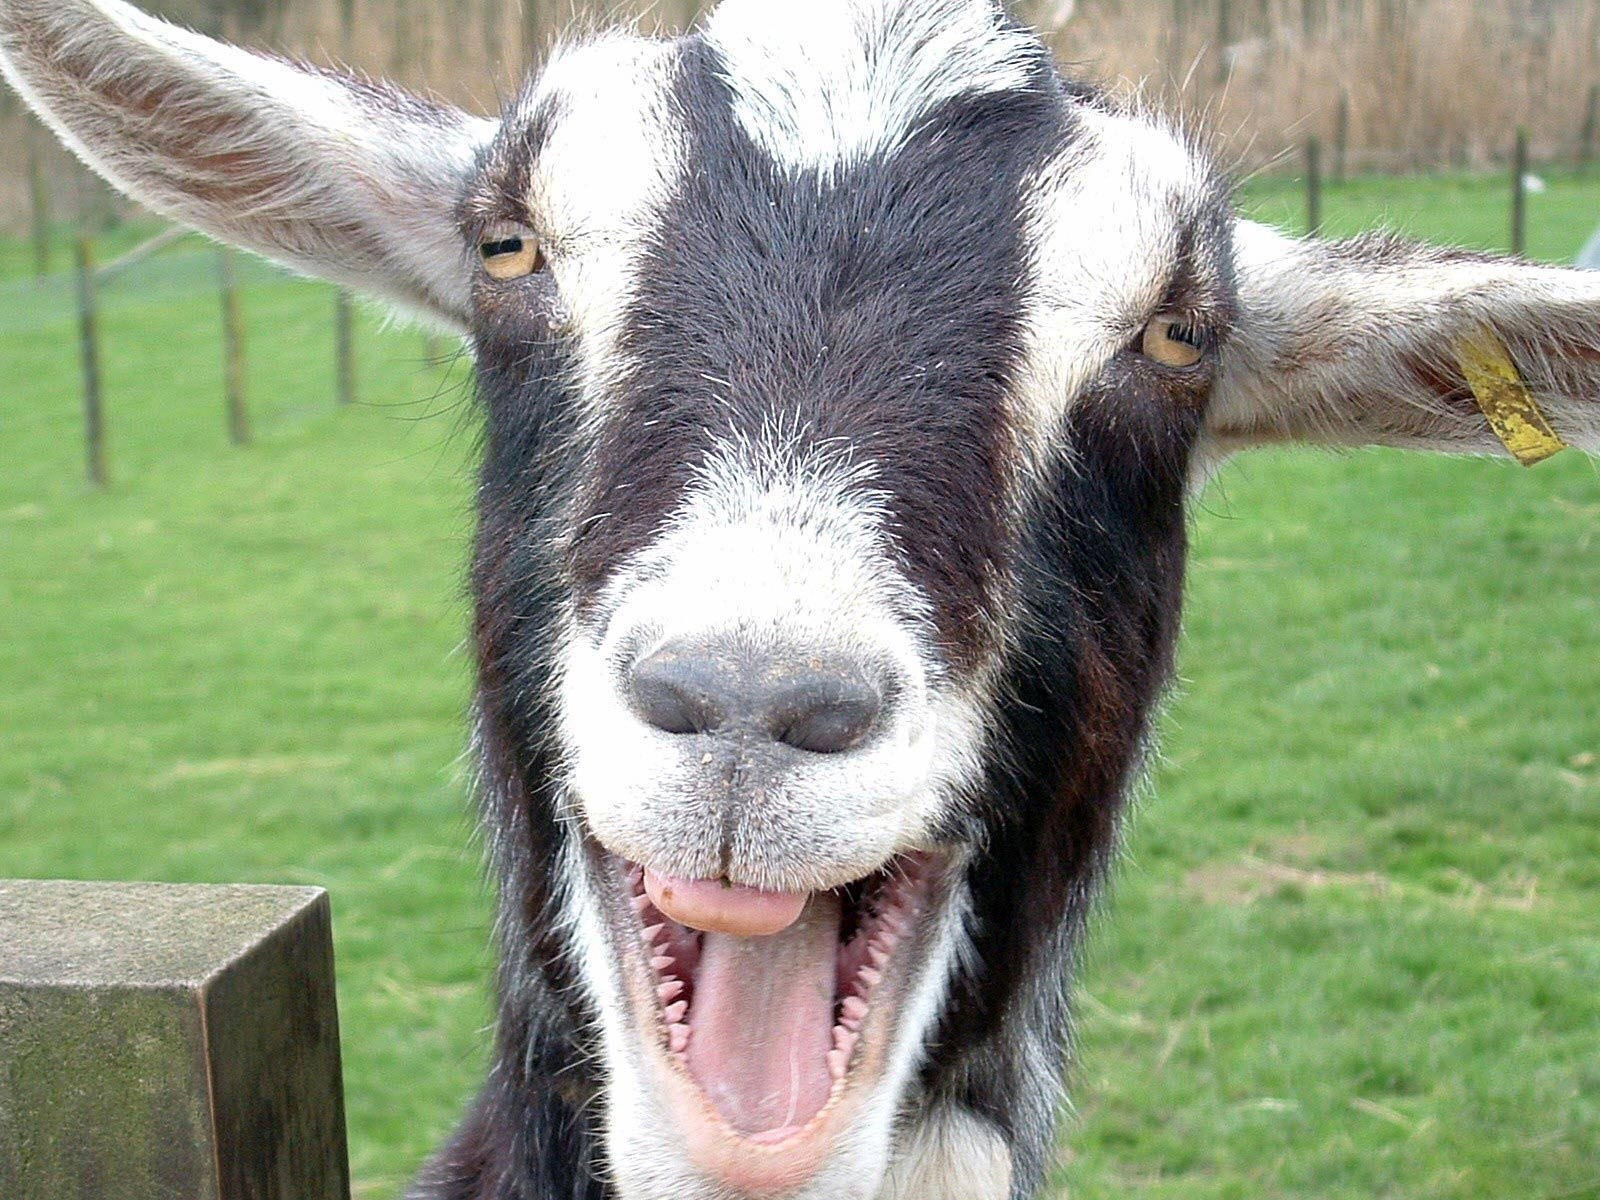 Desktop backgrounds · Backgrounds · Humor | Funny Merry goat joker